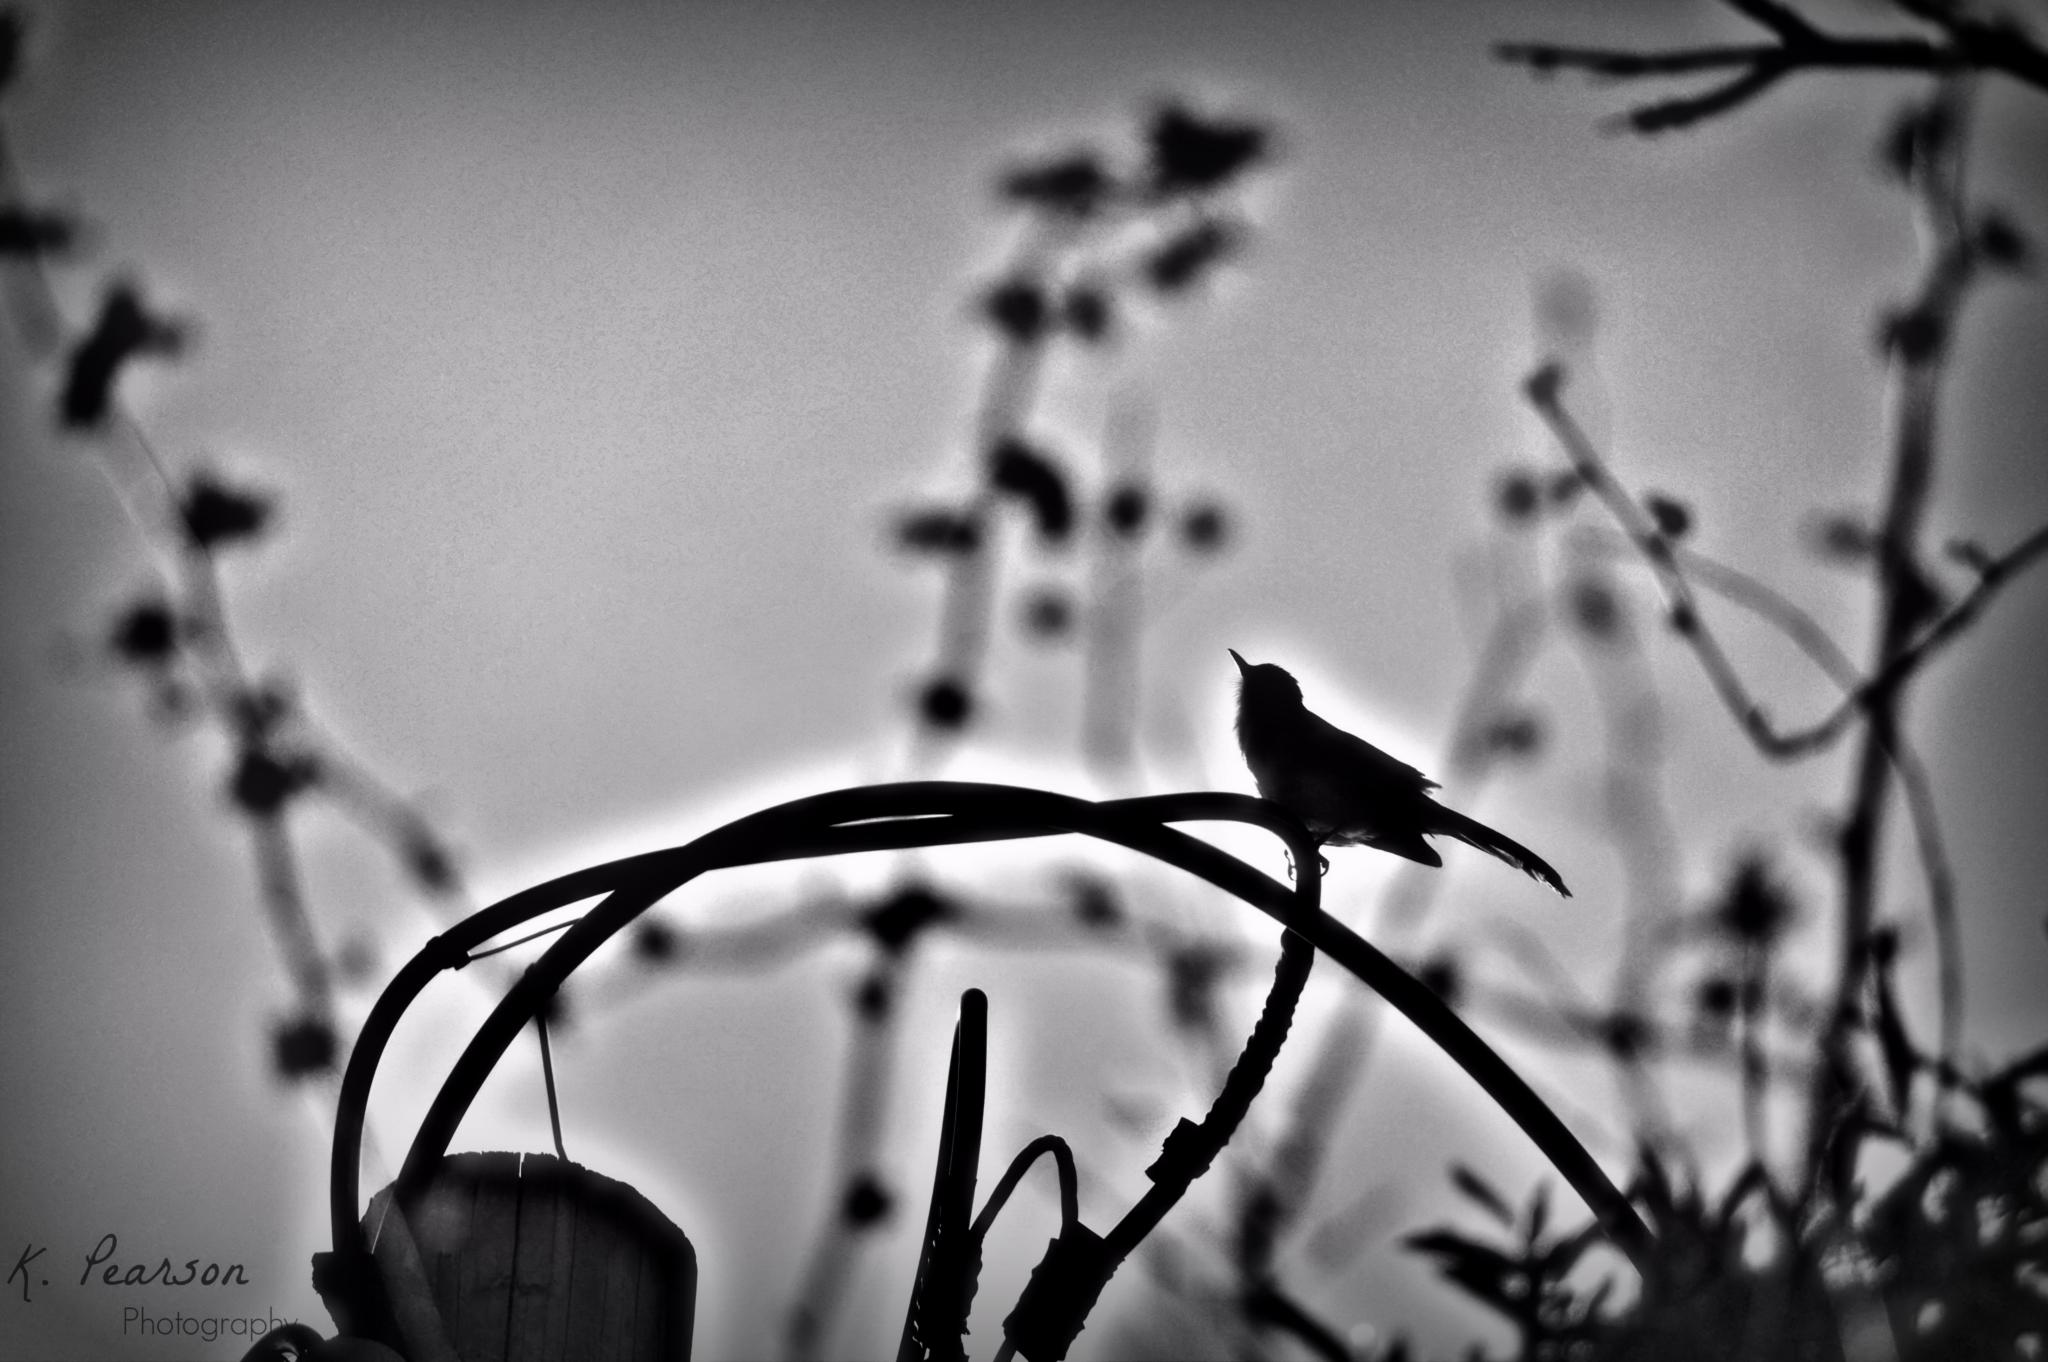 Morning Song by karen.pearson.184